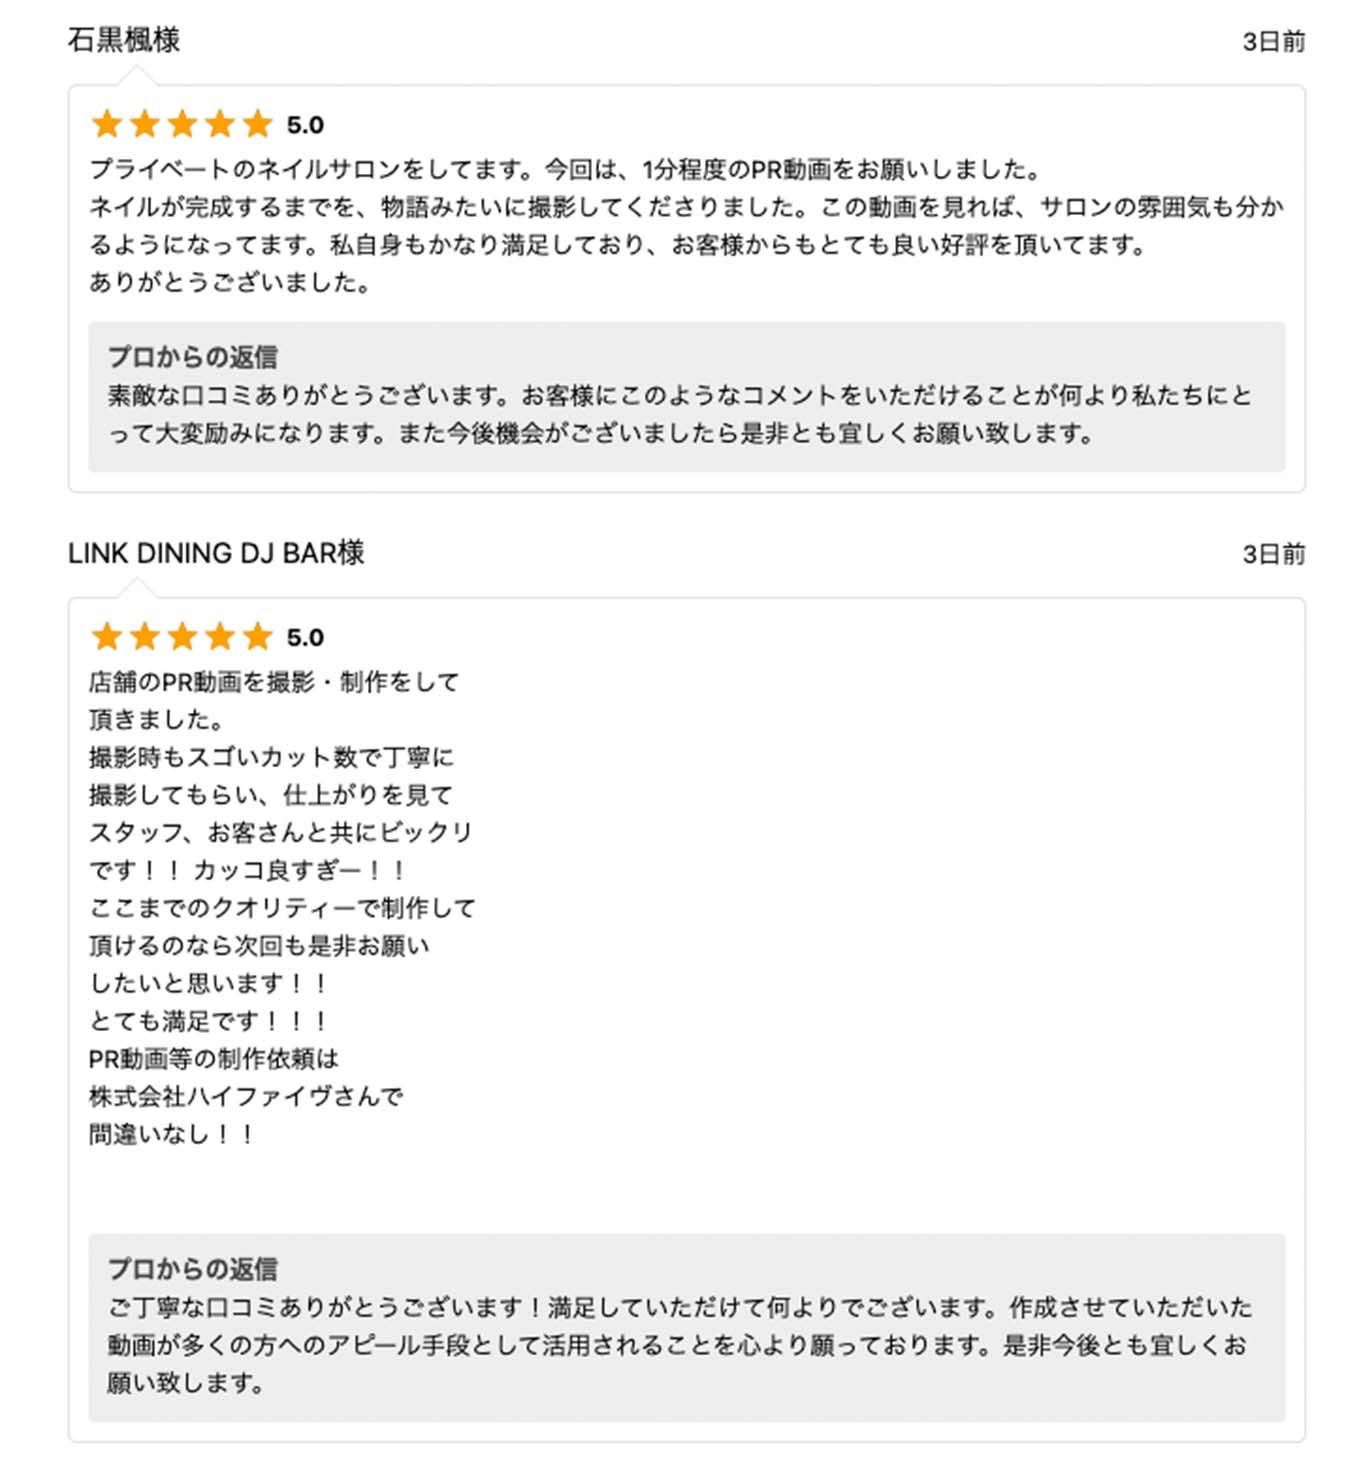 customerreviews2